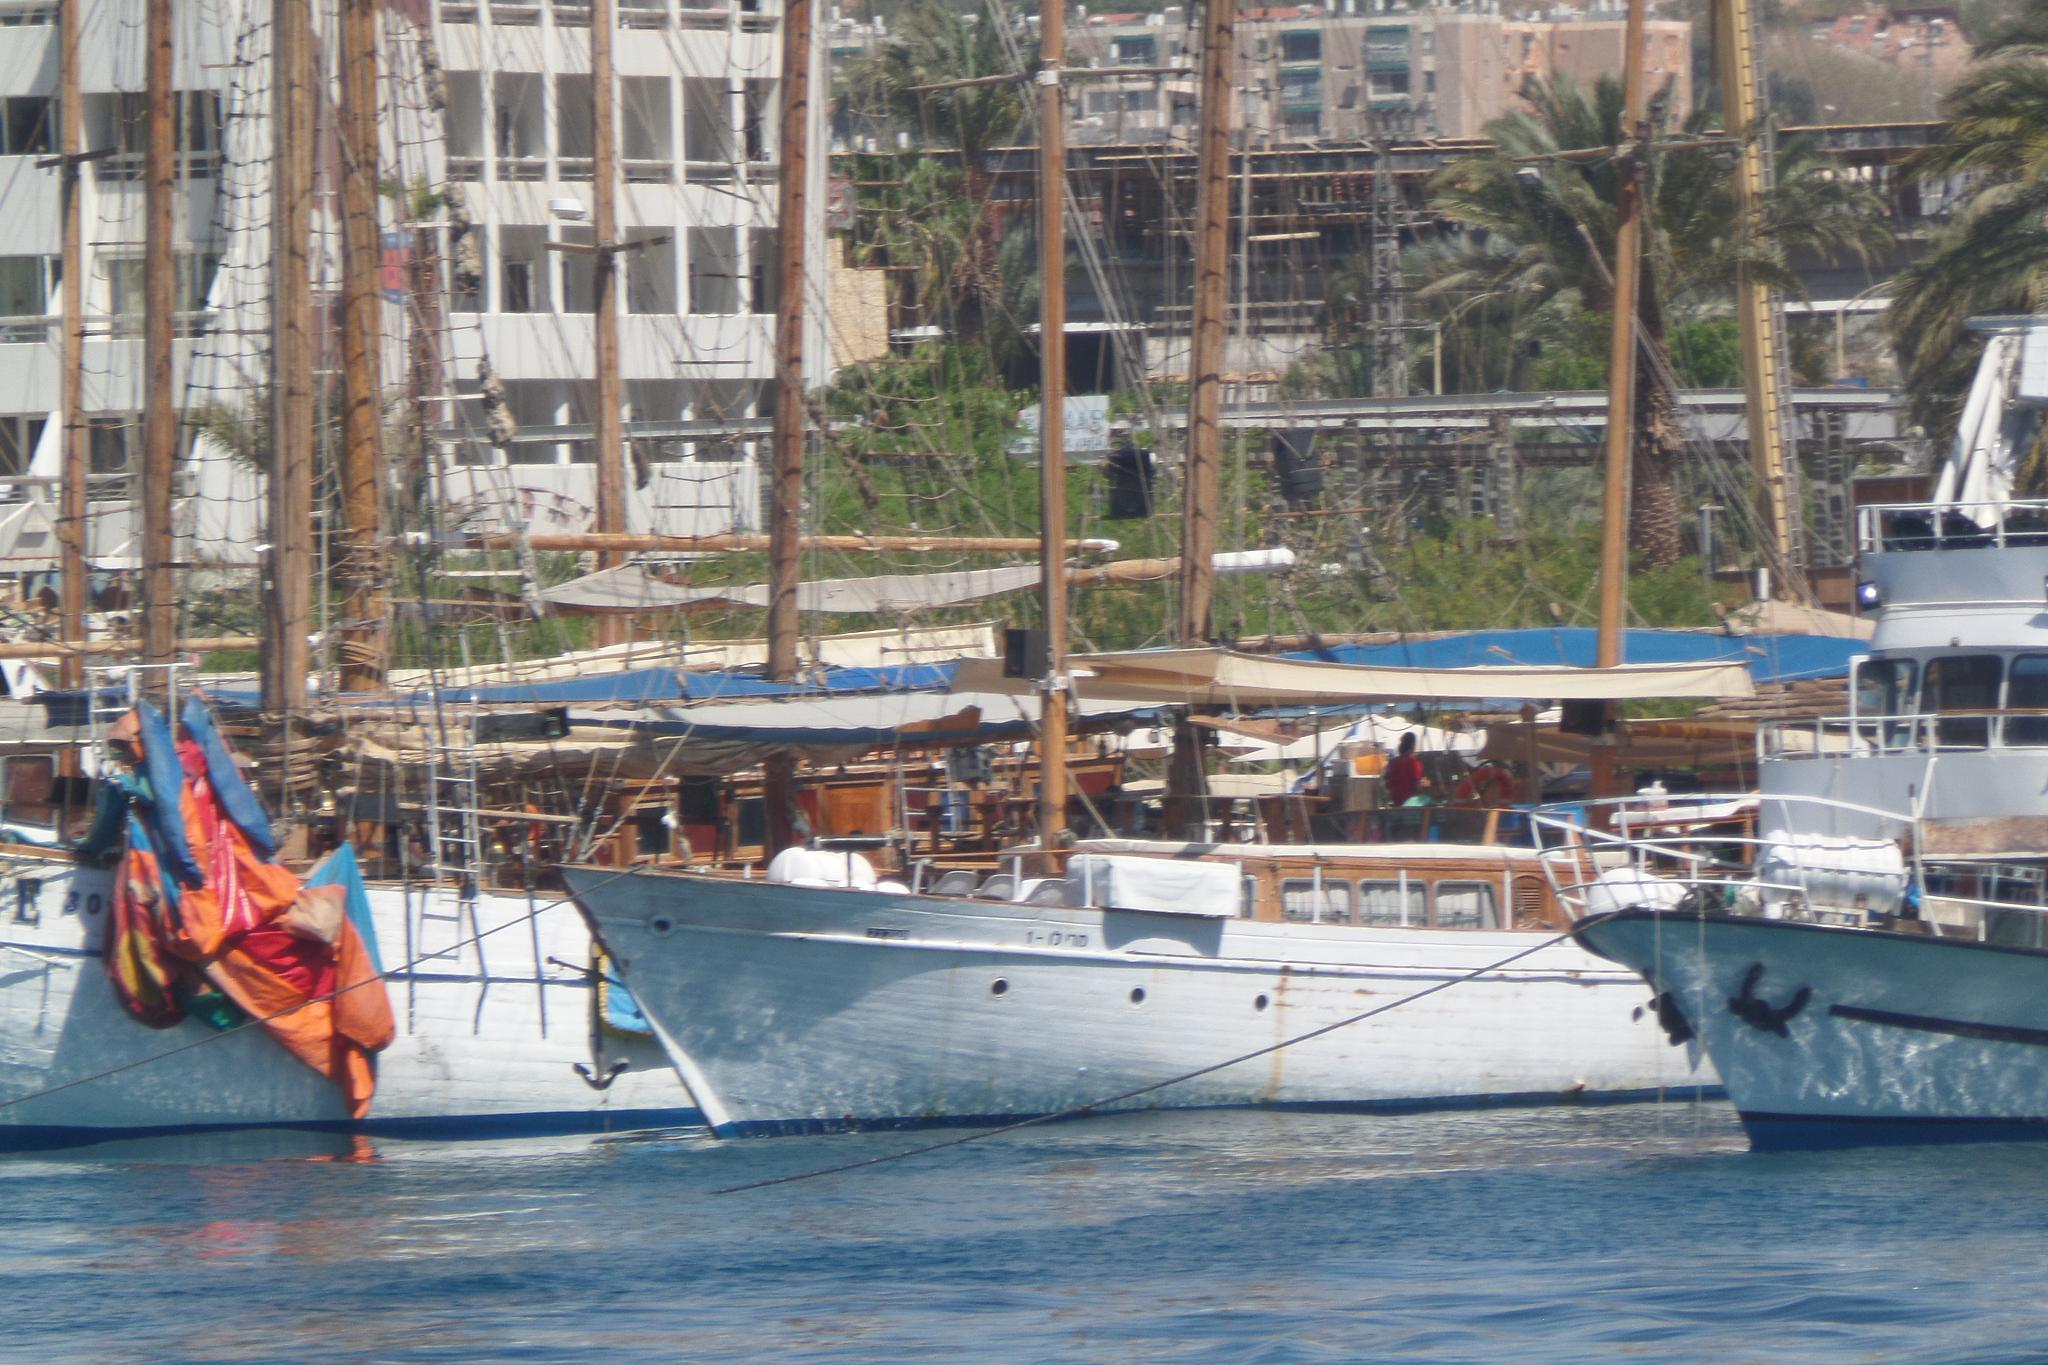 Marina - Eilat by Francine Waterman